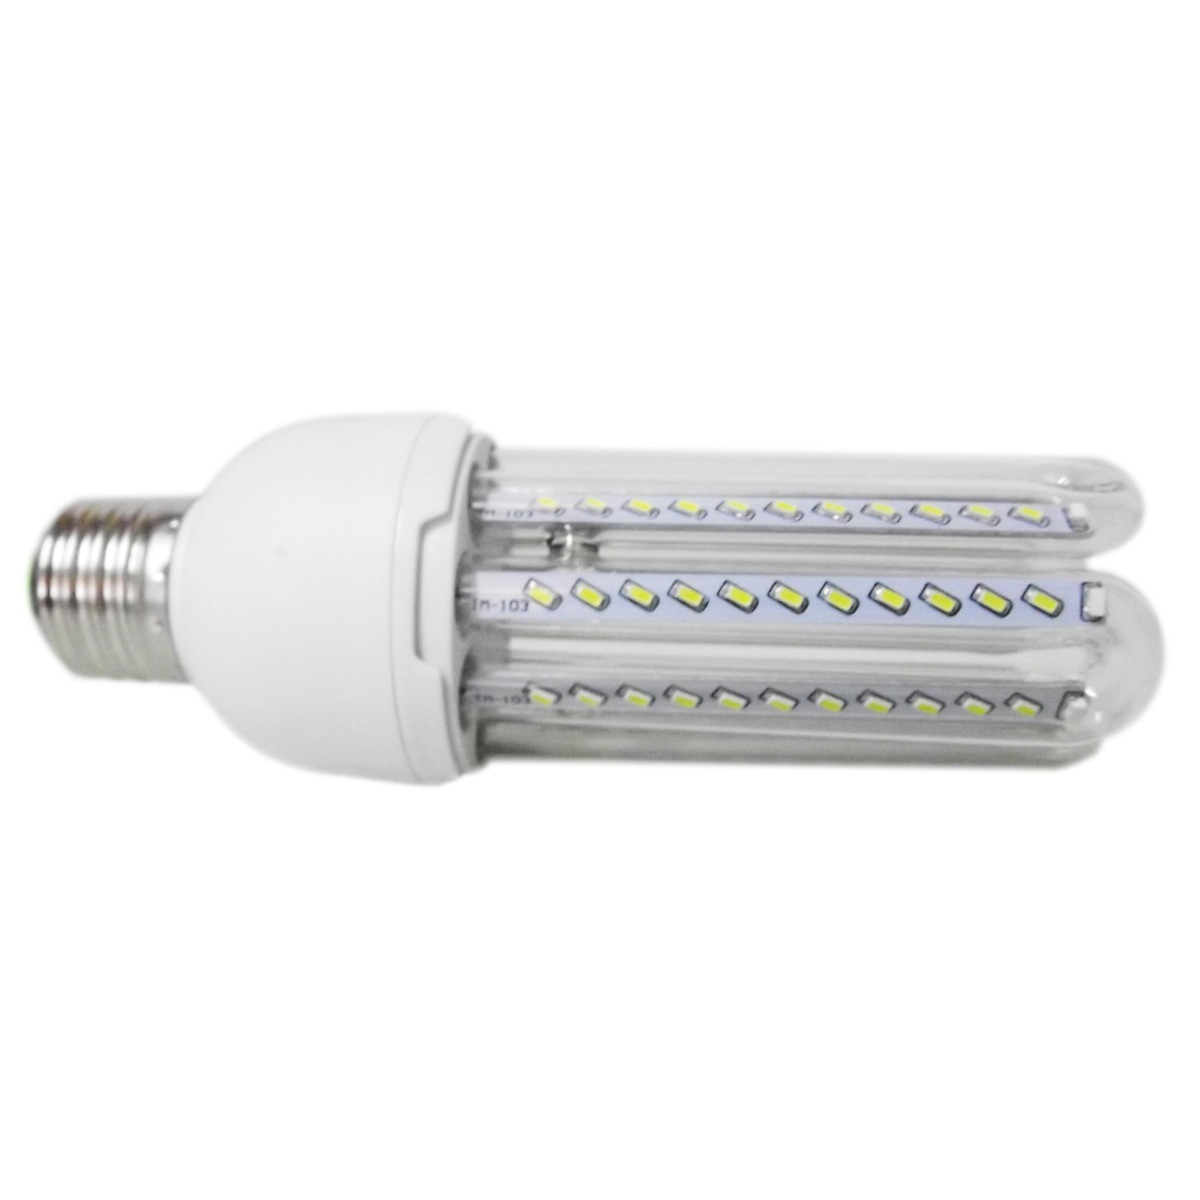 Kit 10 lampada de super led 9w residencial original bivolt for Lampada led